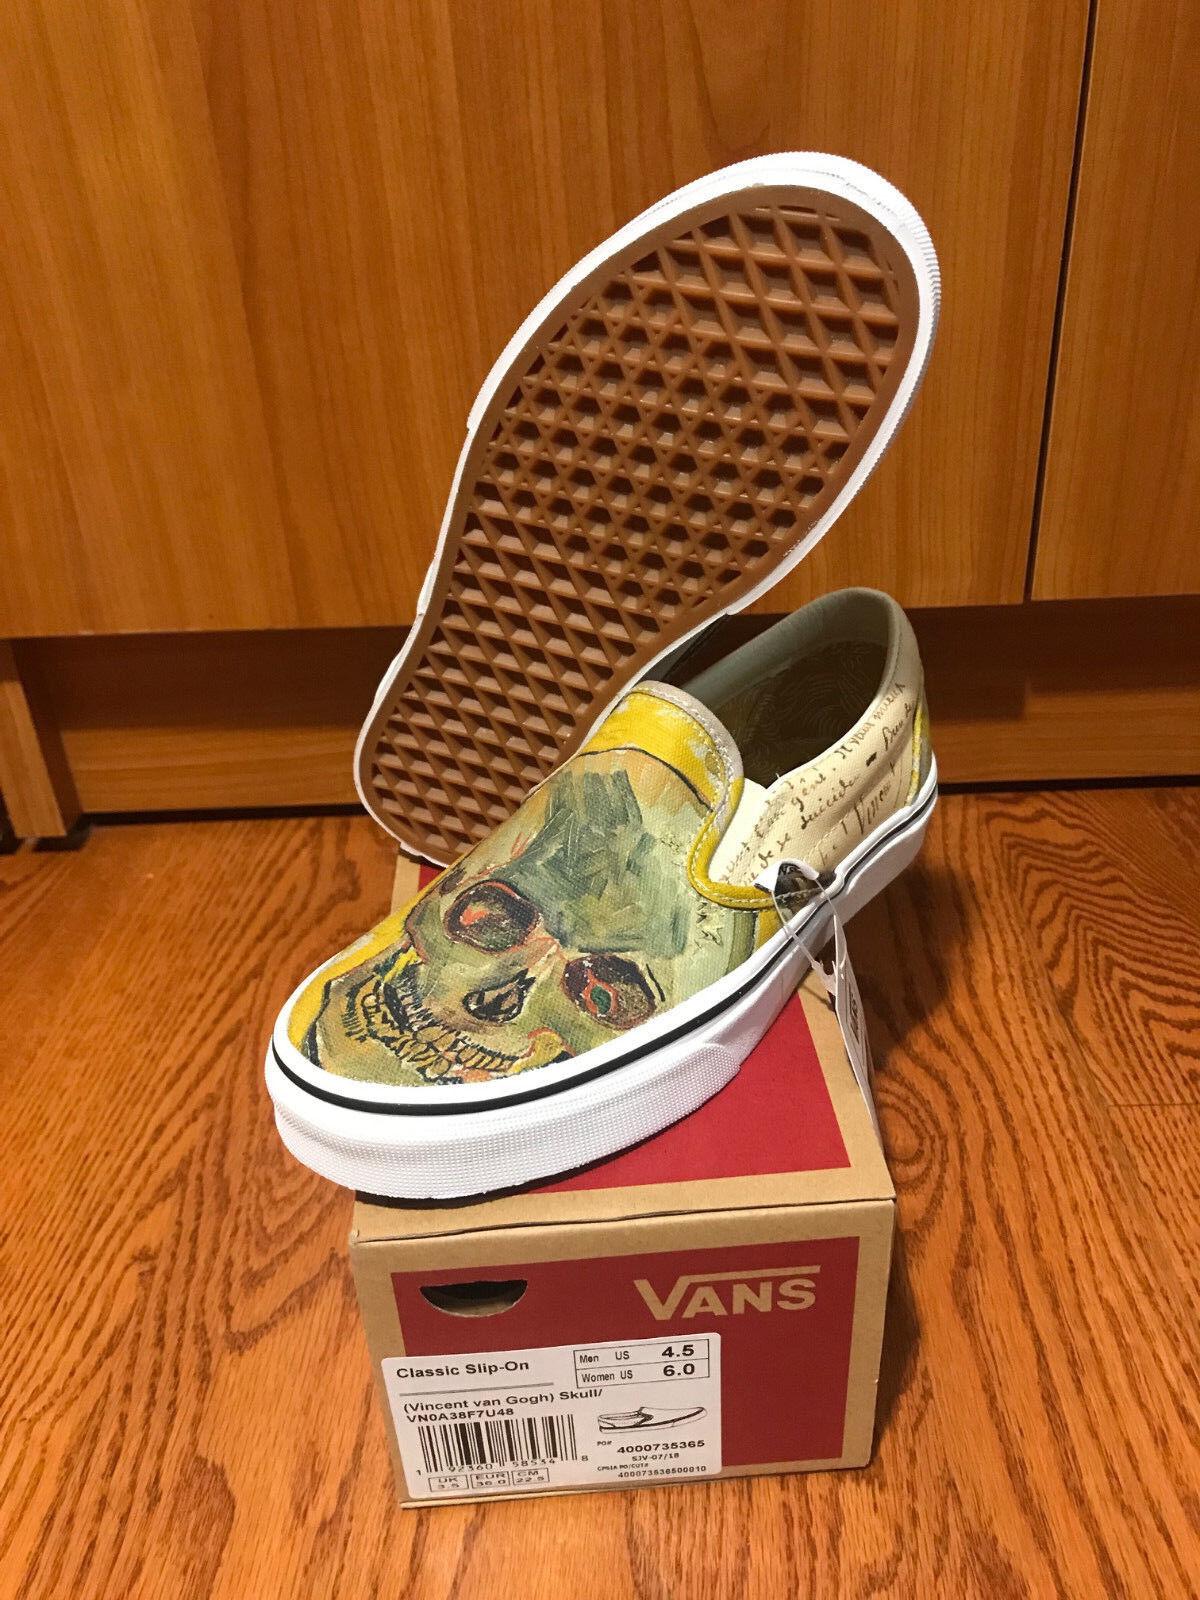 Vans X Vincent Van Gogh Museum Skull Slip On On On Sneaker VN0A38F7U48 In Hand ee3d6c